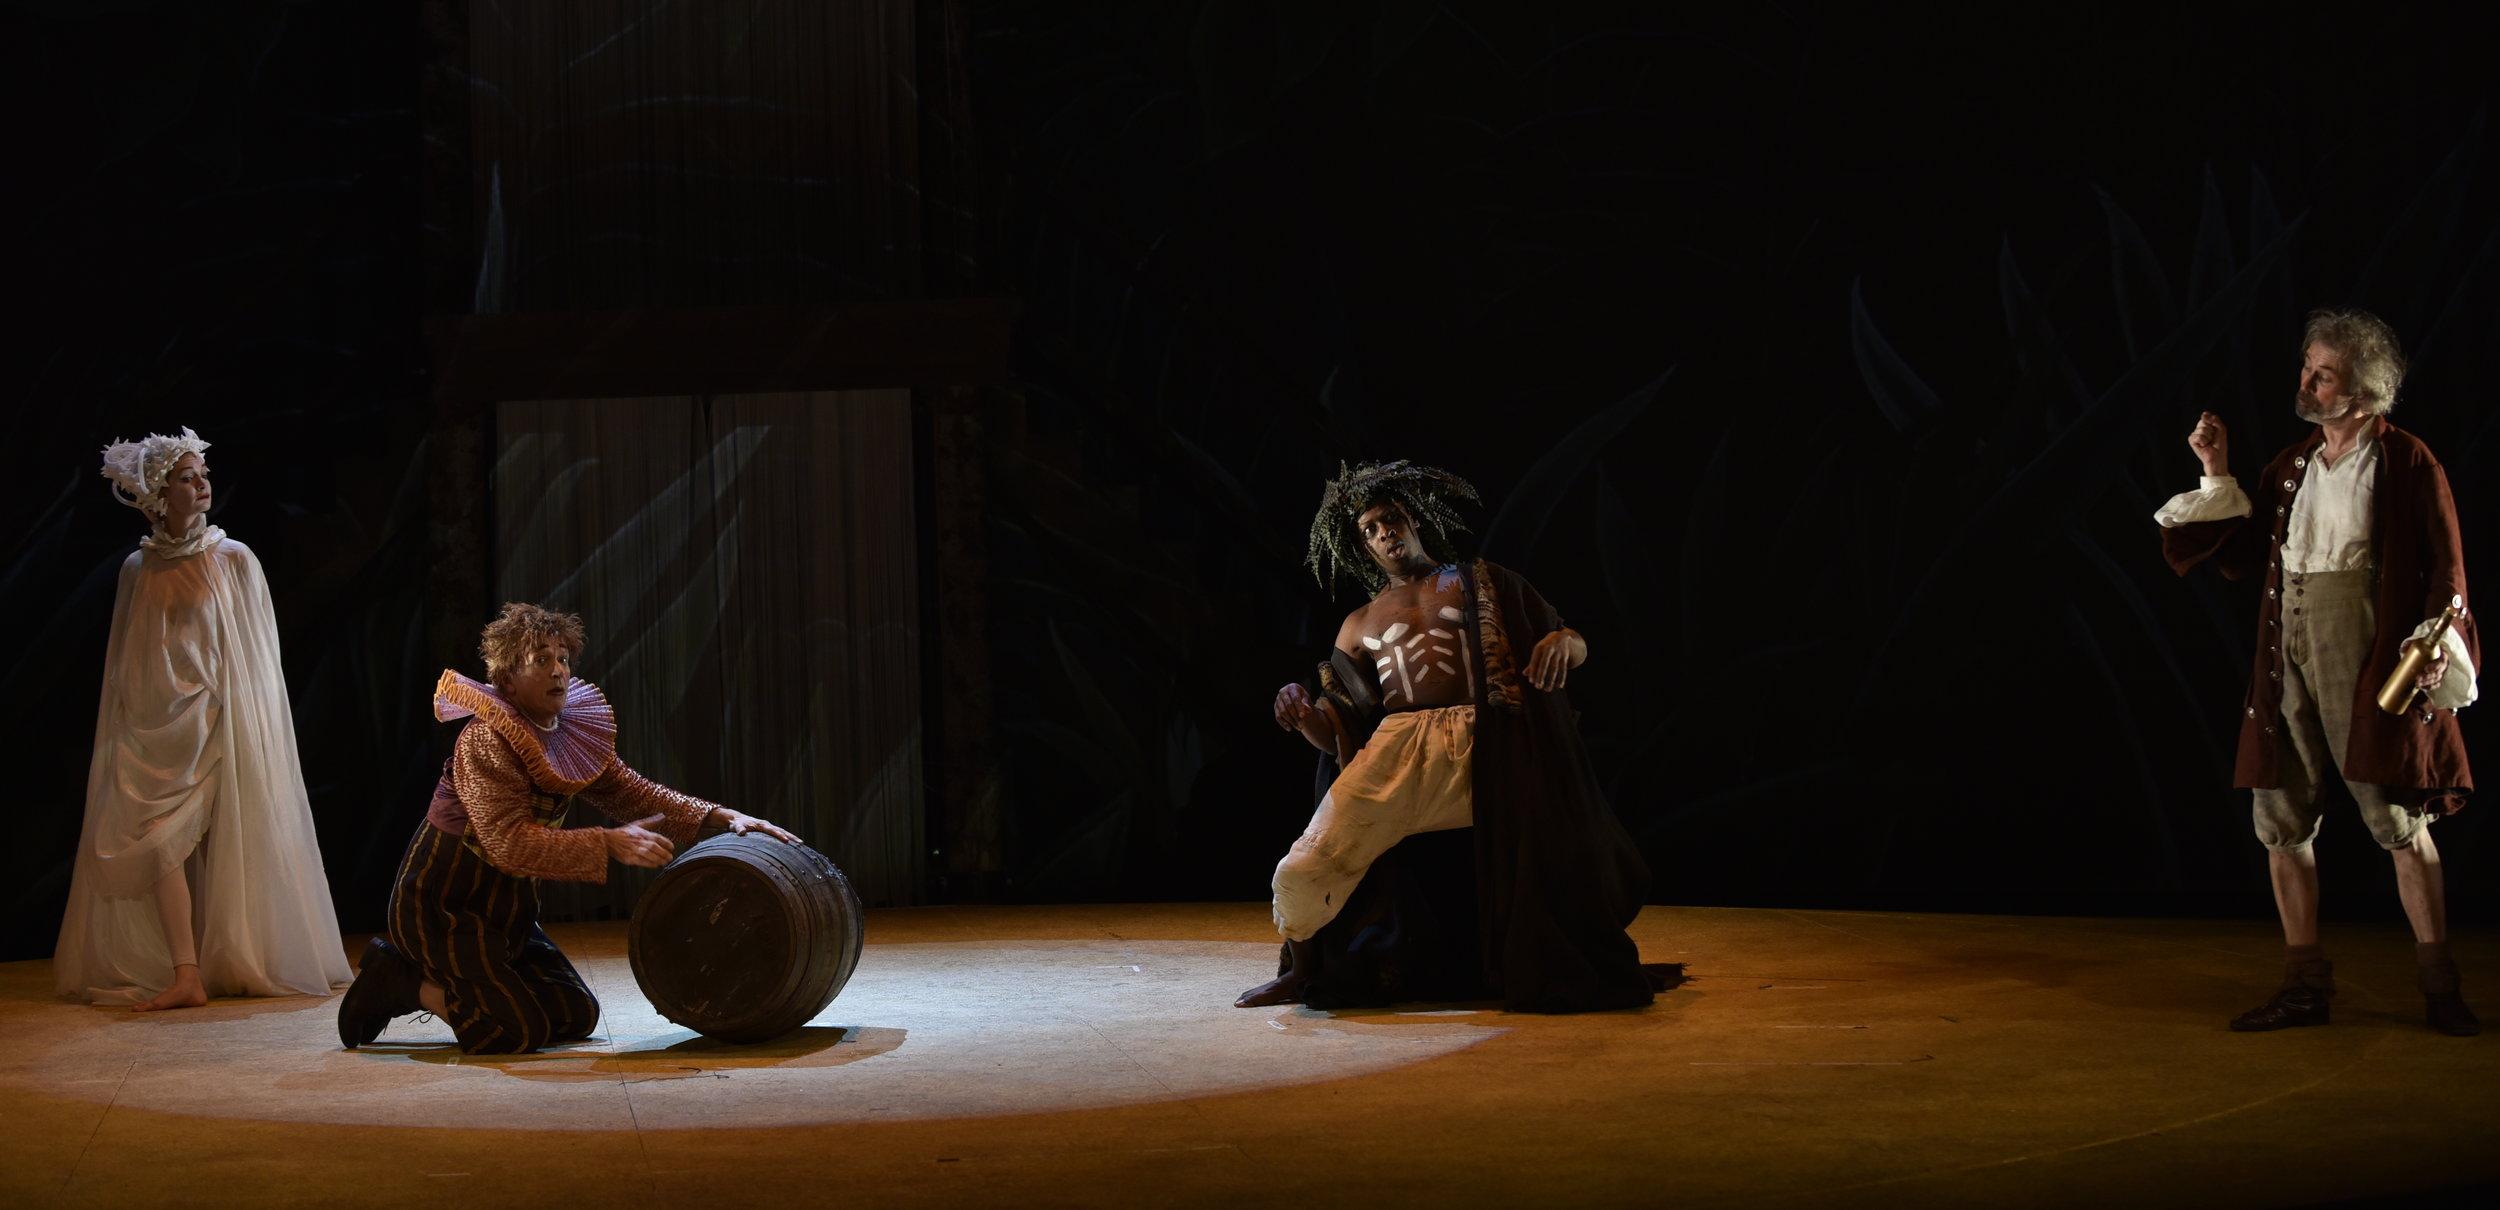 Chiraz Aïch as  Ariel , Stéphane Delbasse as  Trinculo,  Hervé Goffings as  Caliban  and Jean-Louis Fayollet as  Stephano.